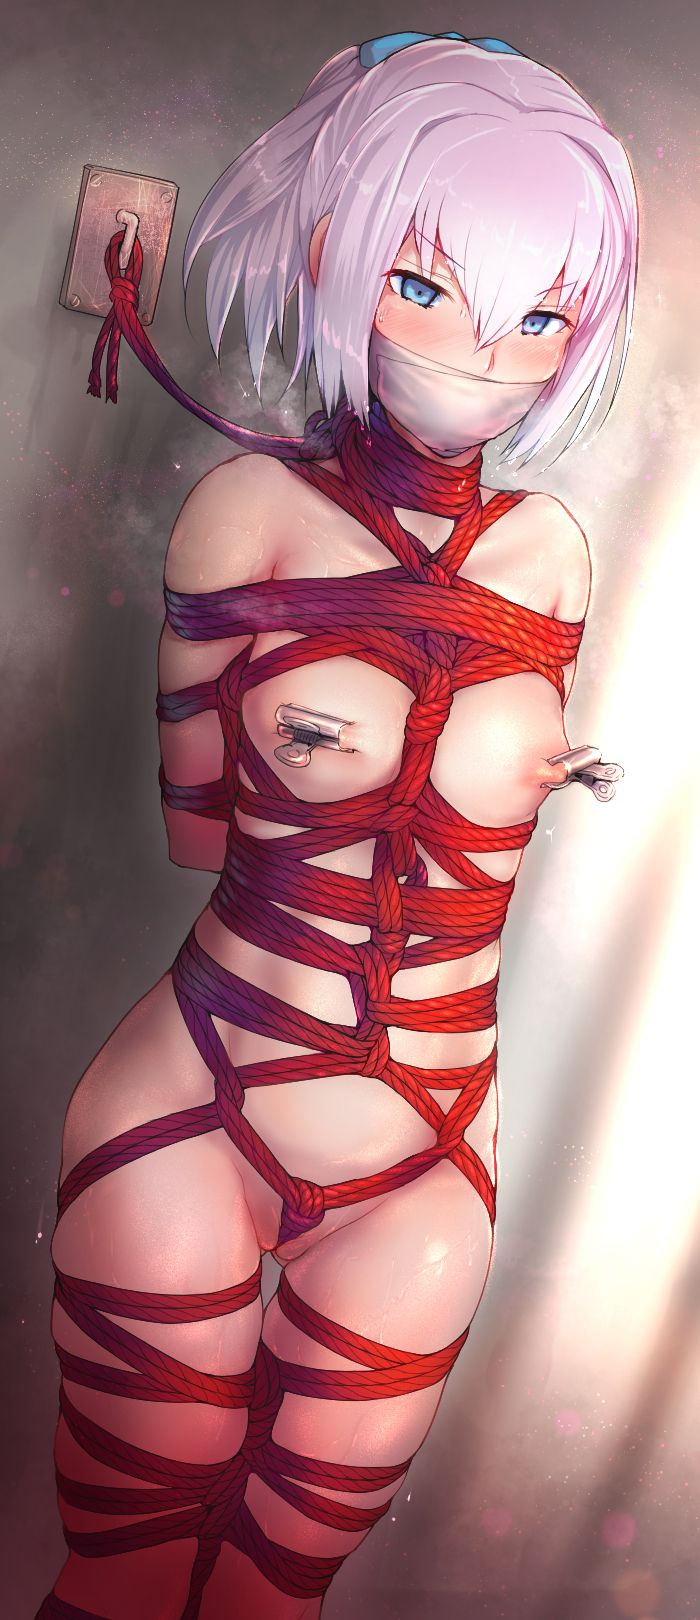 crotch_rope206